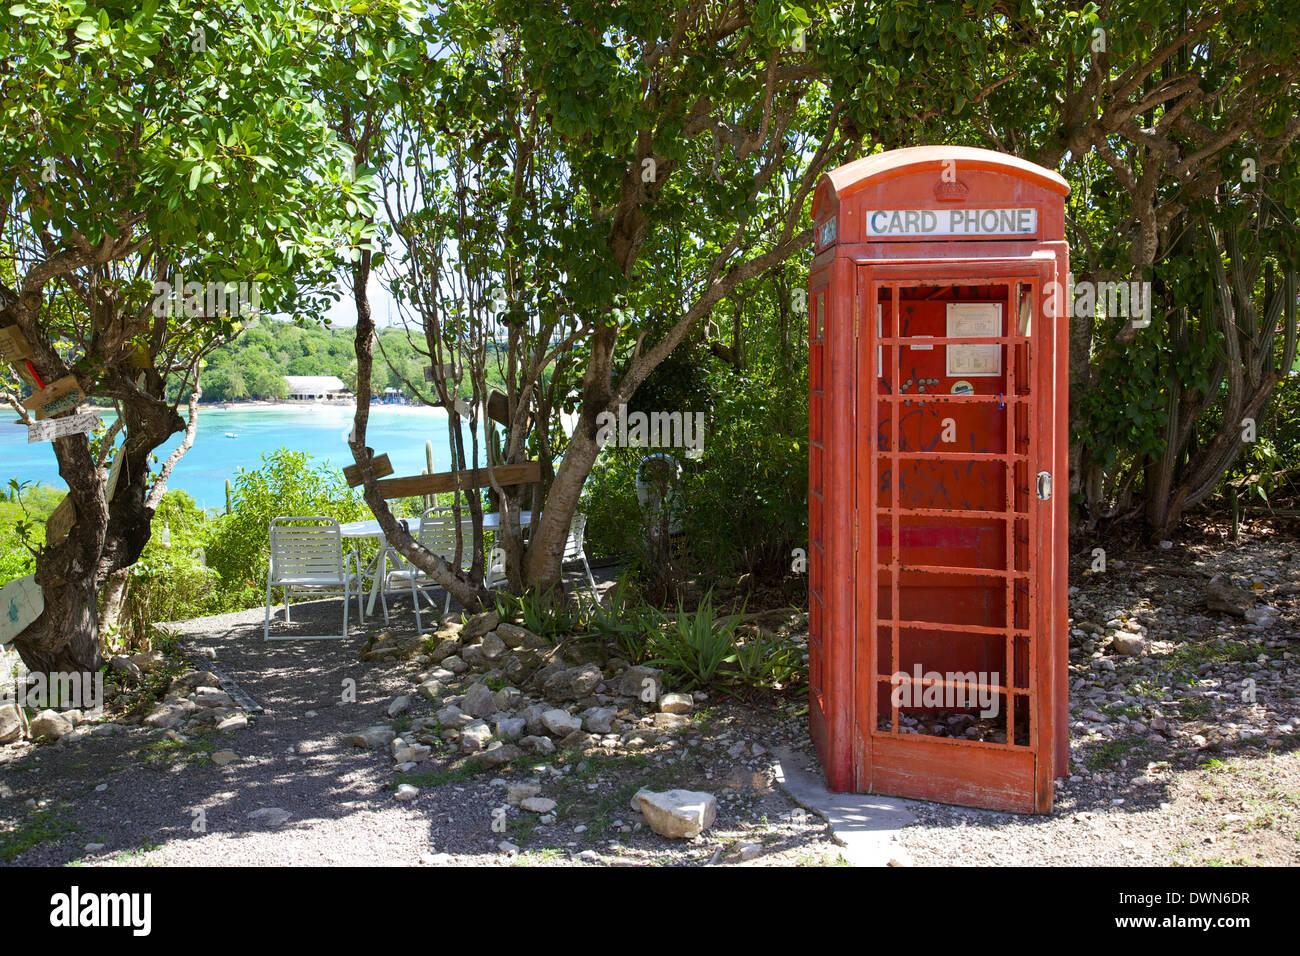 Red Telephone Box at Mama Pasta's, Long Bay, Antigua, Leeward Islands, West Indies, Caribbean, Central America - Stock Image